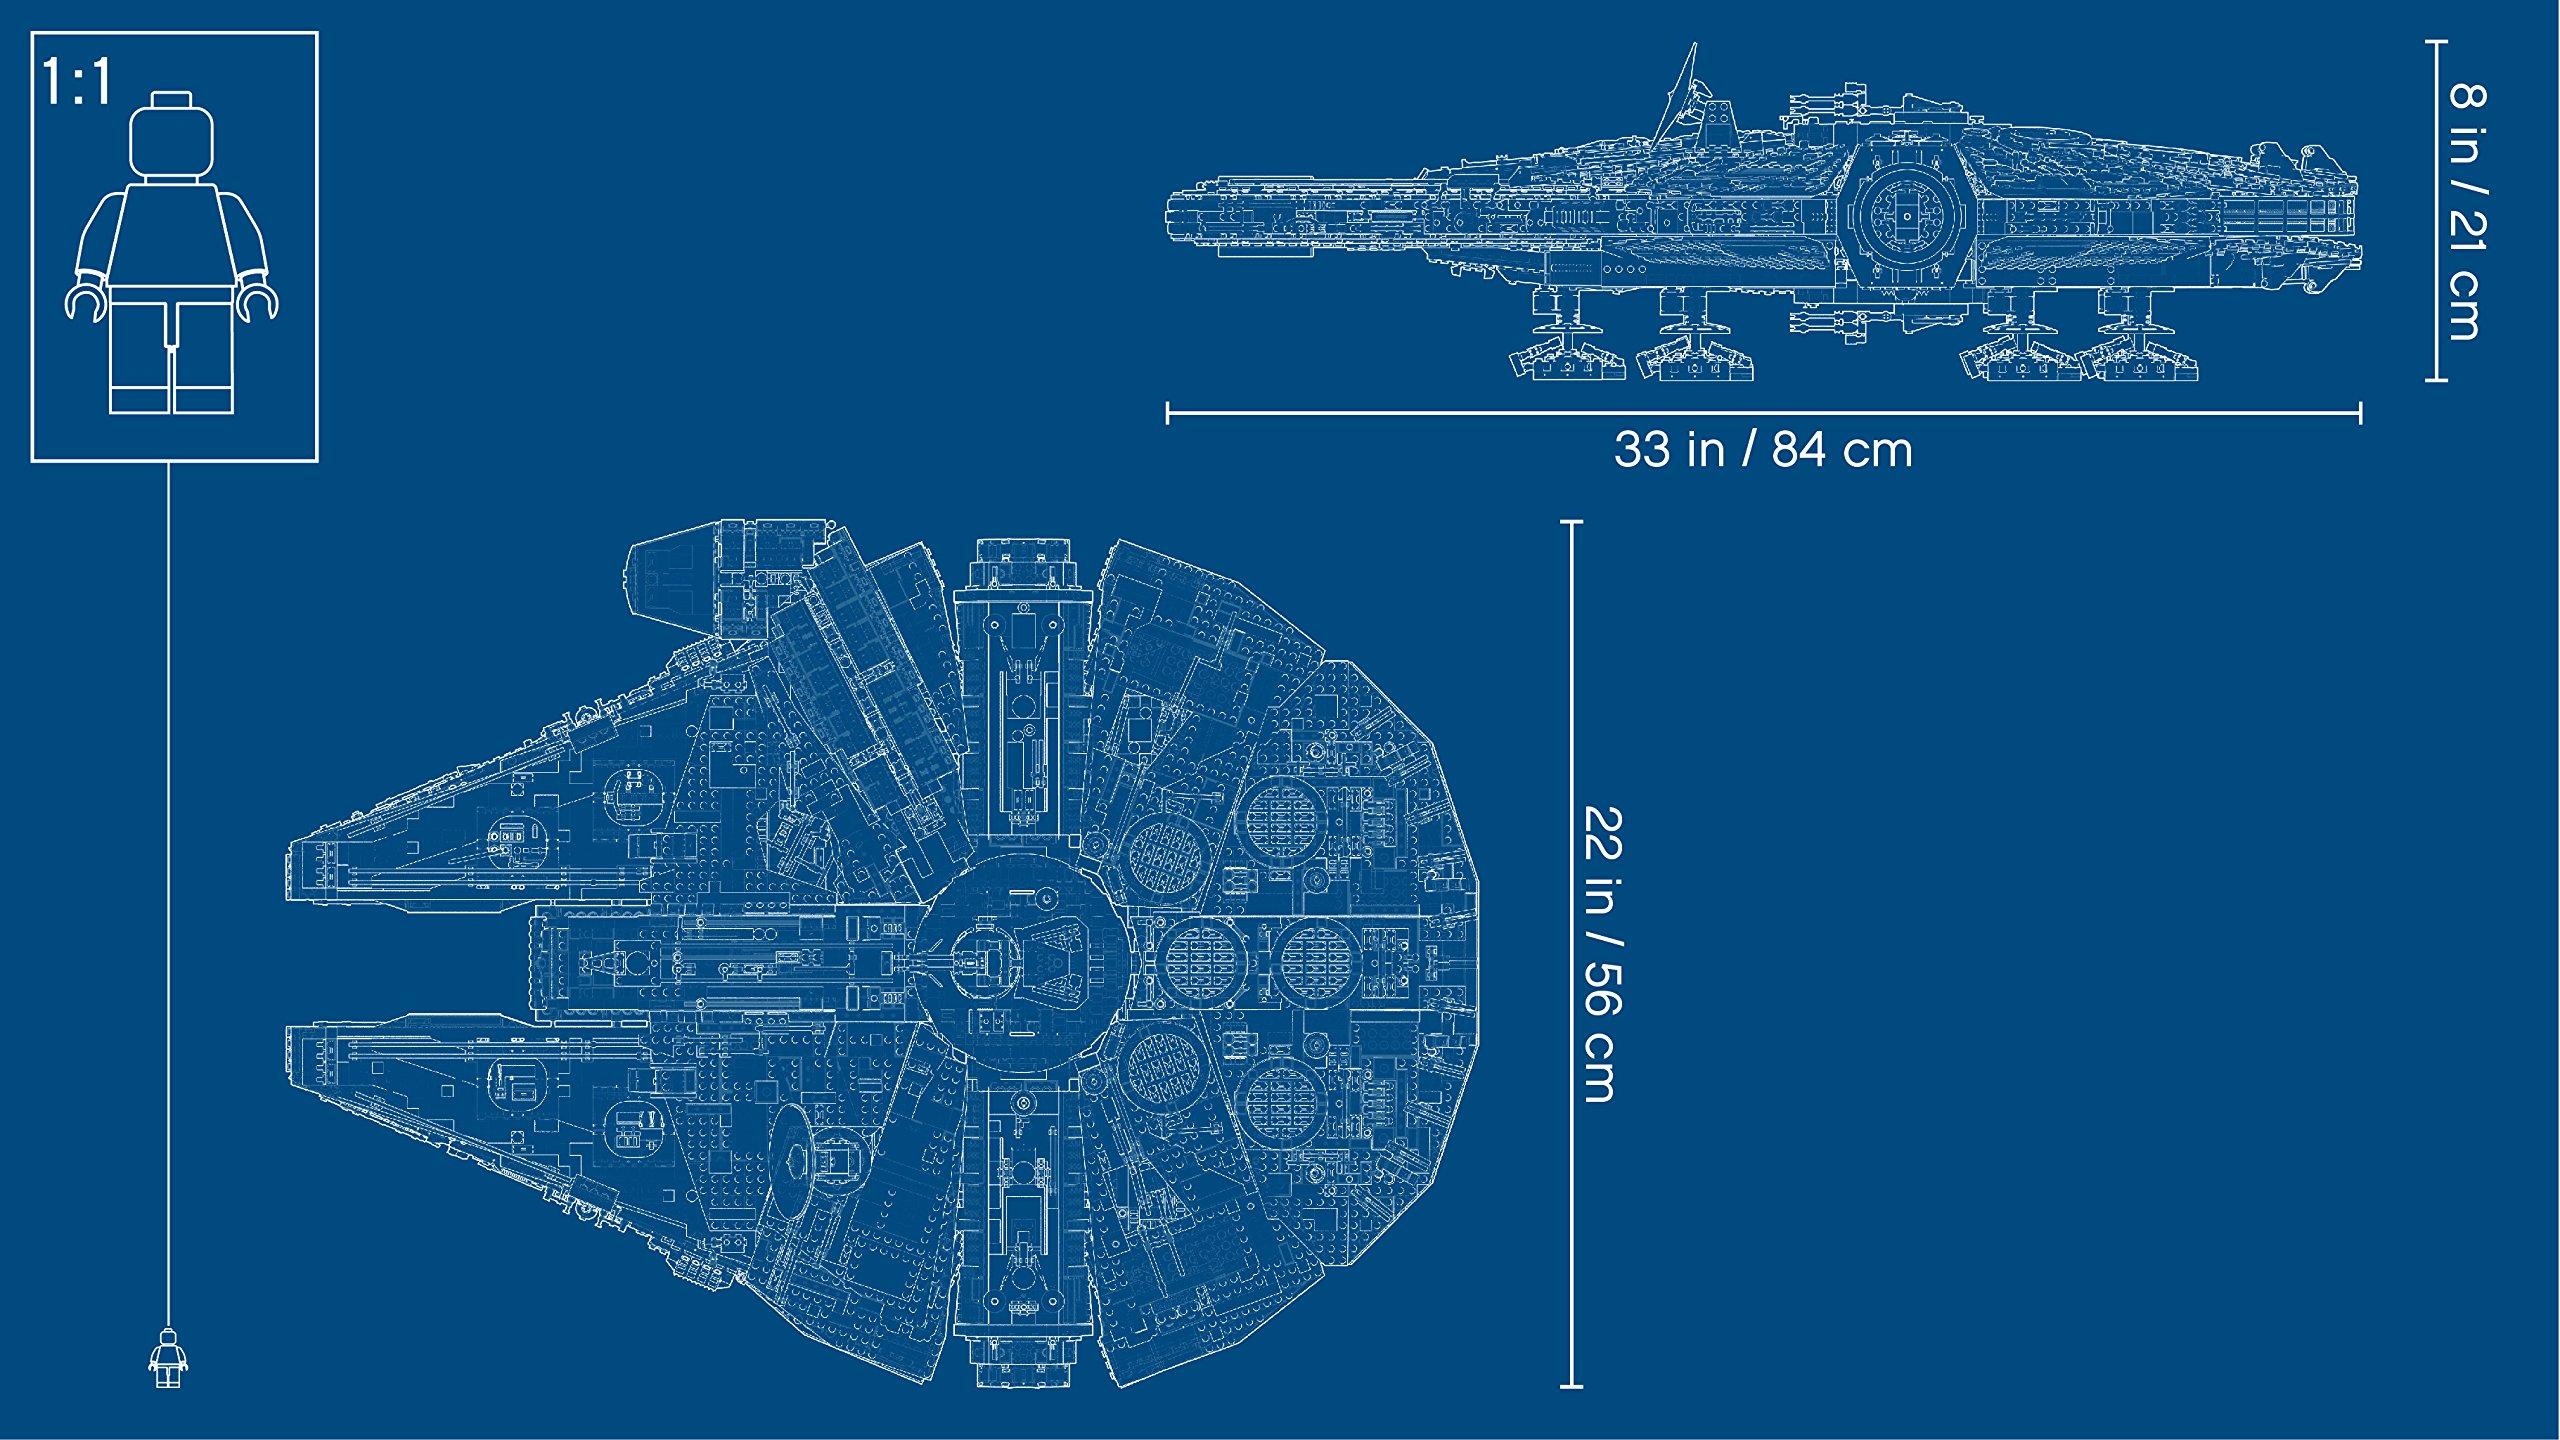 LEGO Star Wars Millennium Falcon 75192 Building Kit (7541 Piece) by LEGO (Image #6)